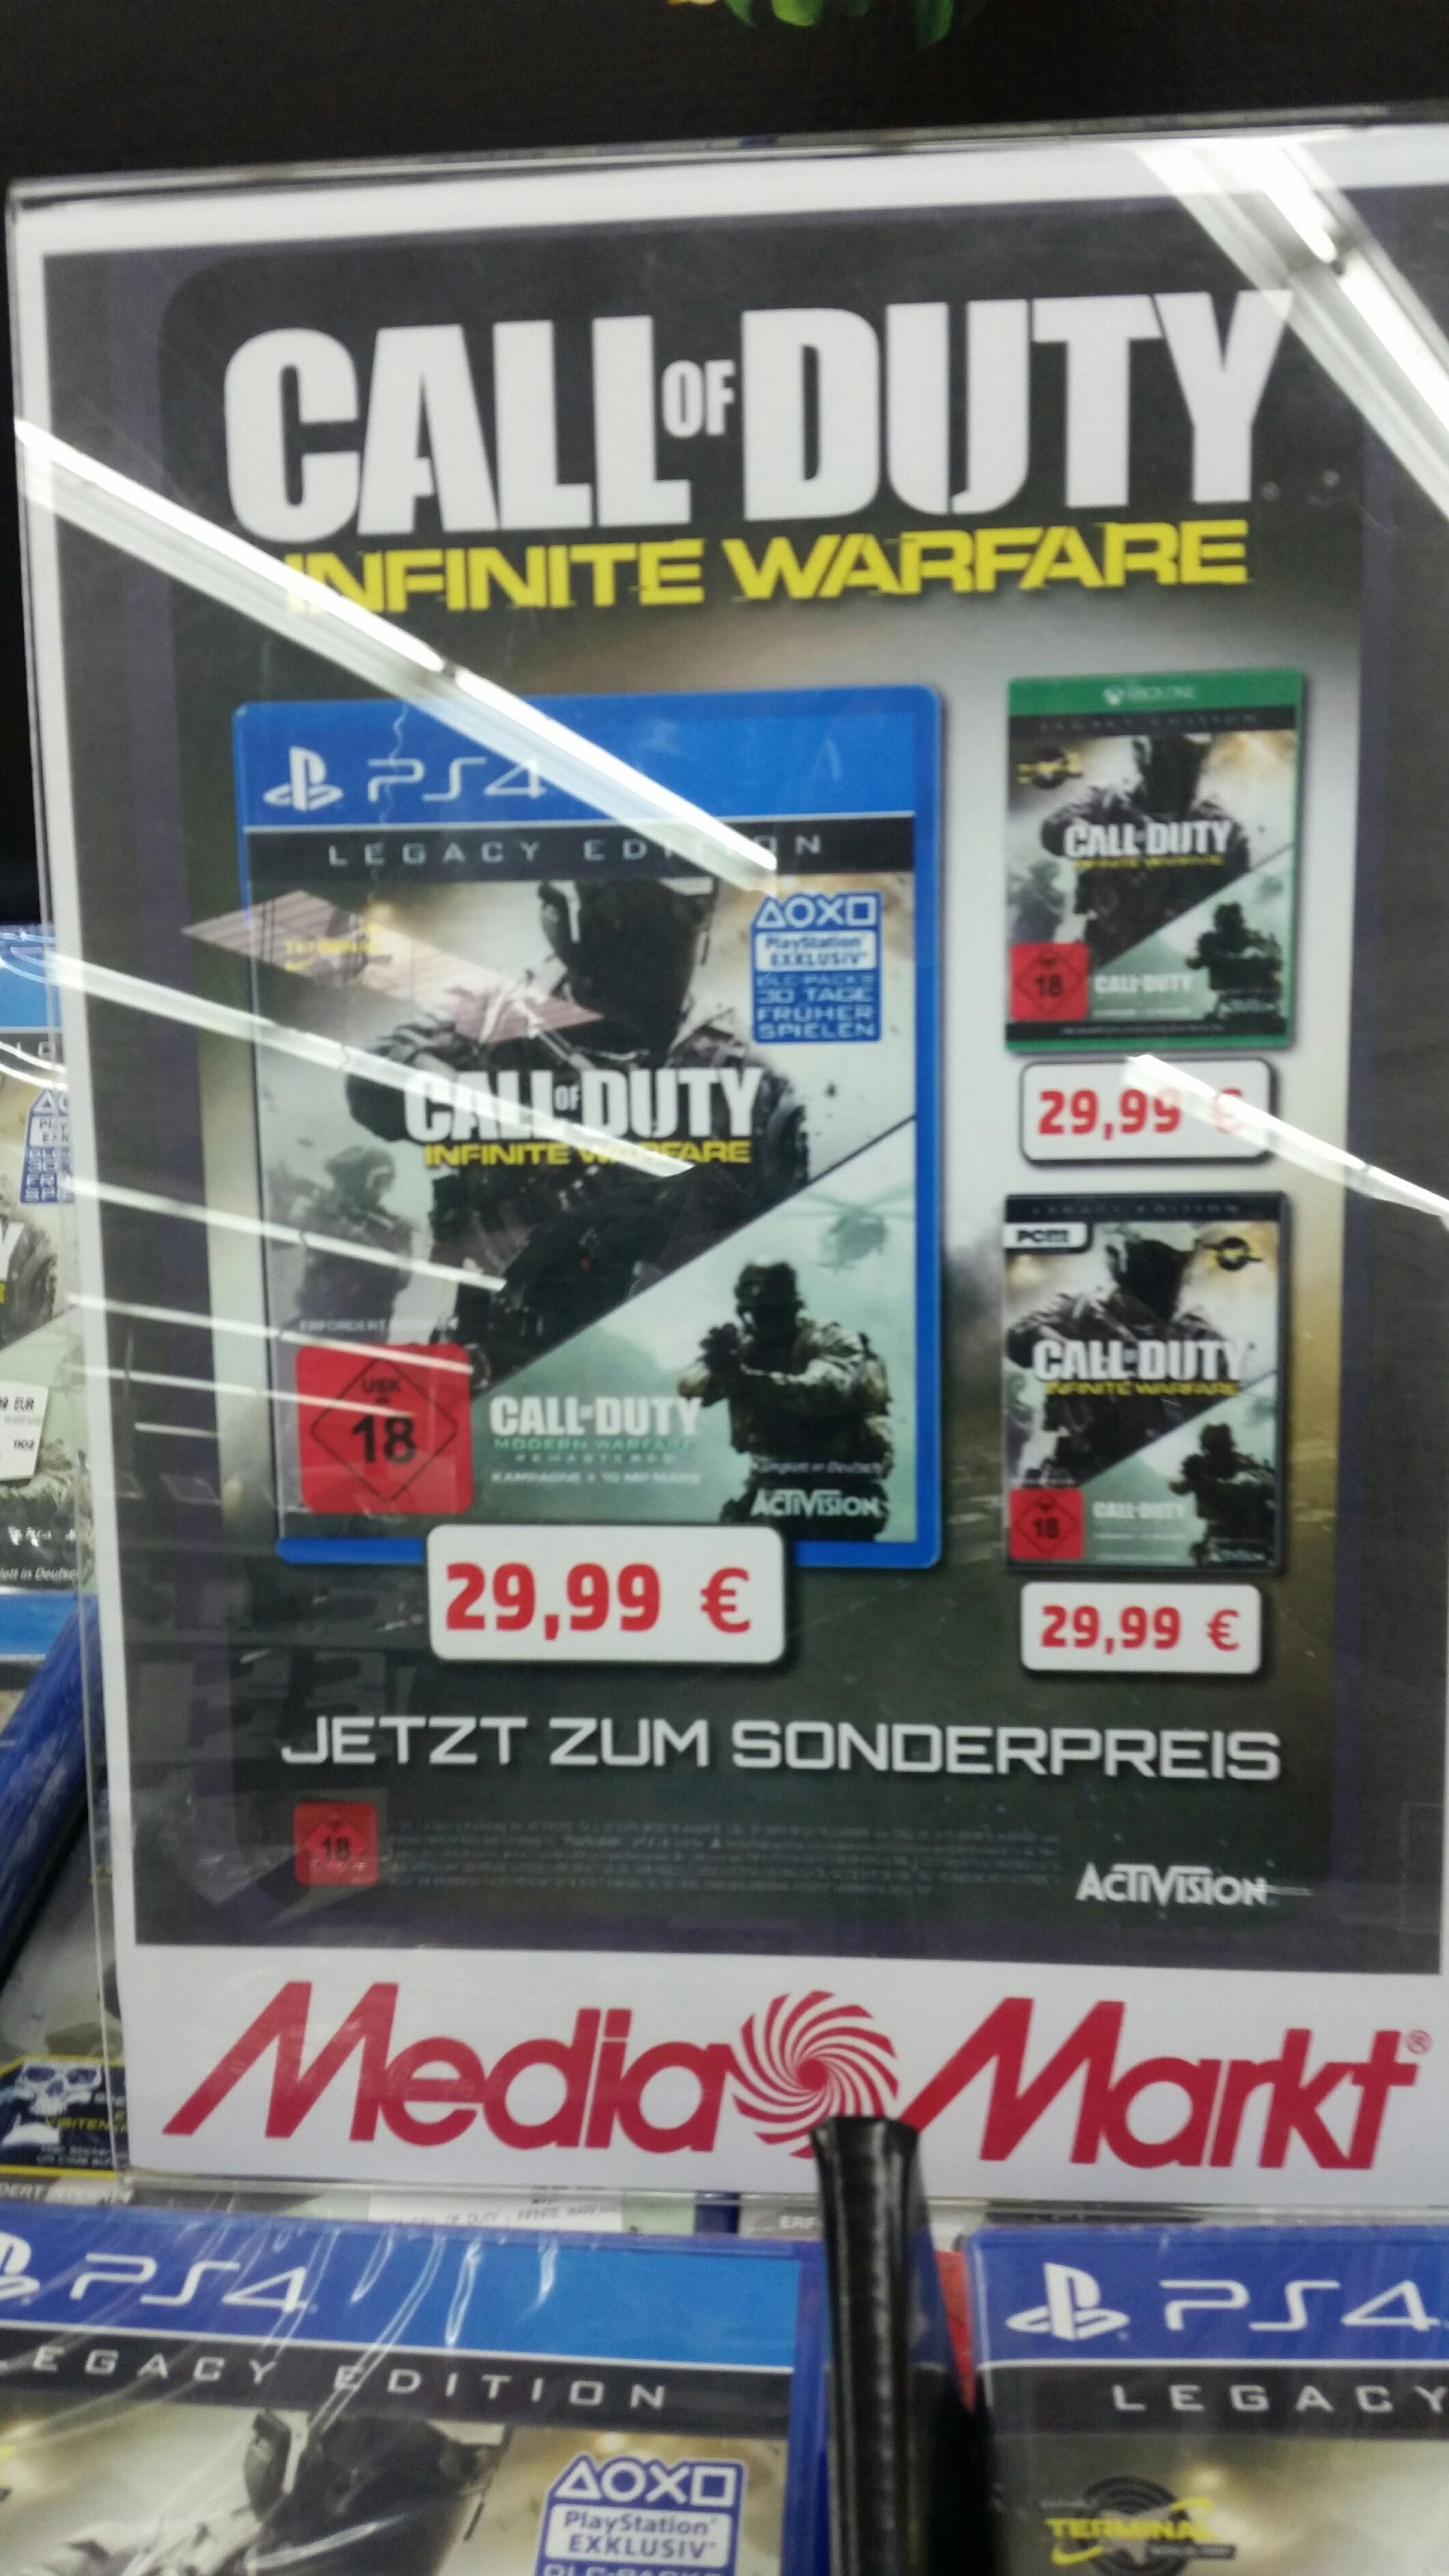 [Lokal Mediamarkt Porta Westfalica] Call of Duty: Infinite Warfare Legacy Edition (PS4 und XB 1) für je 29.99€